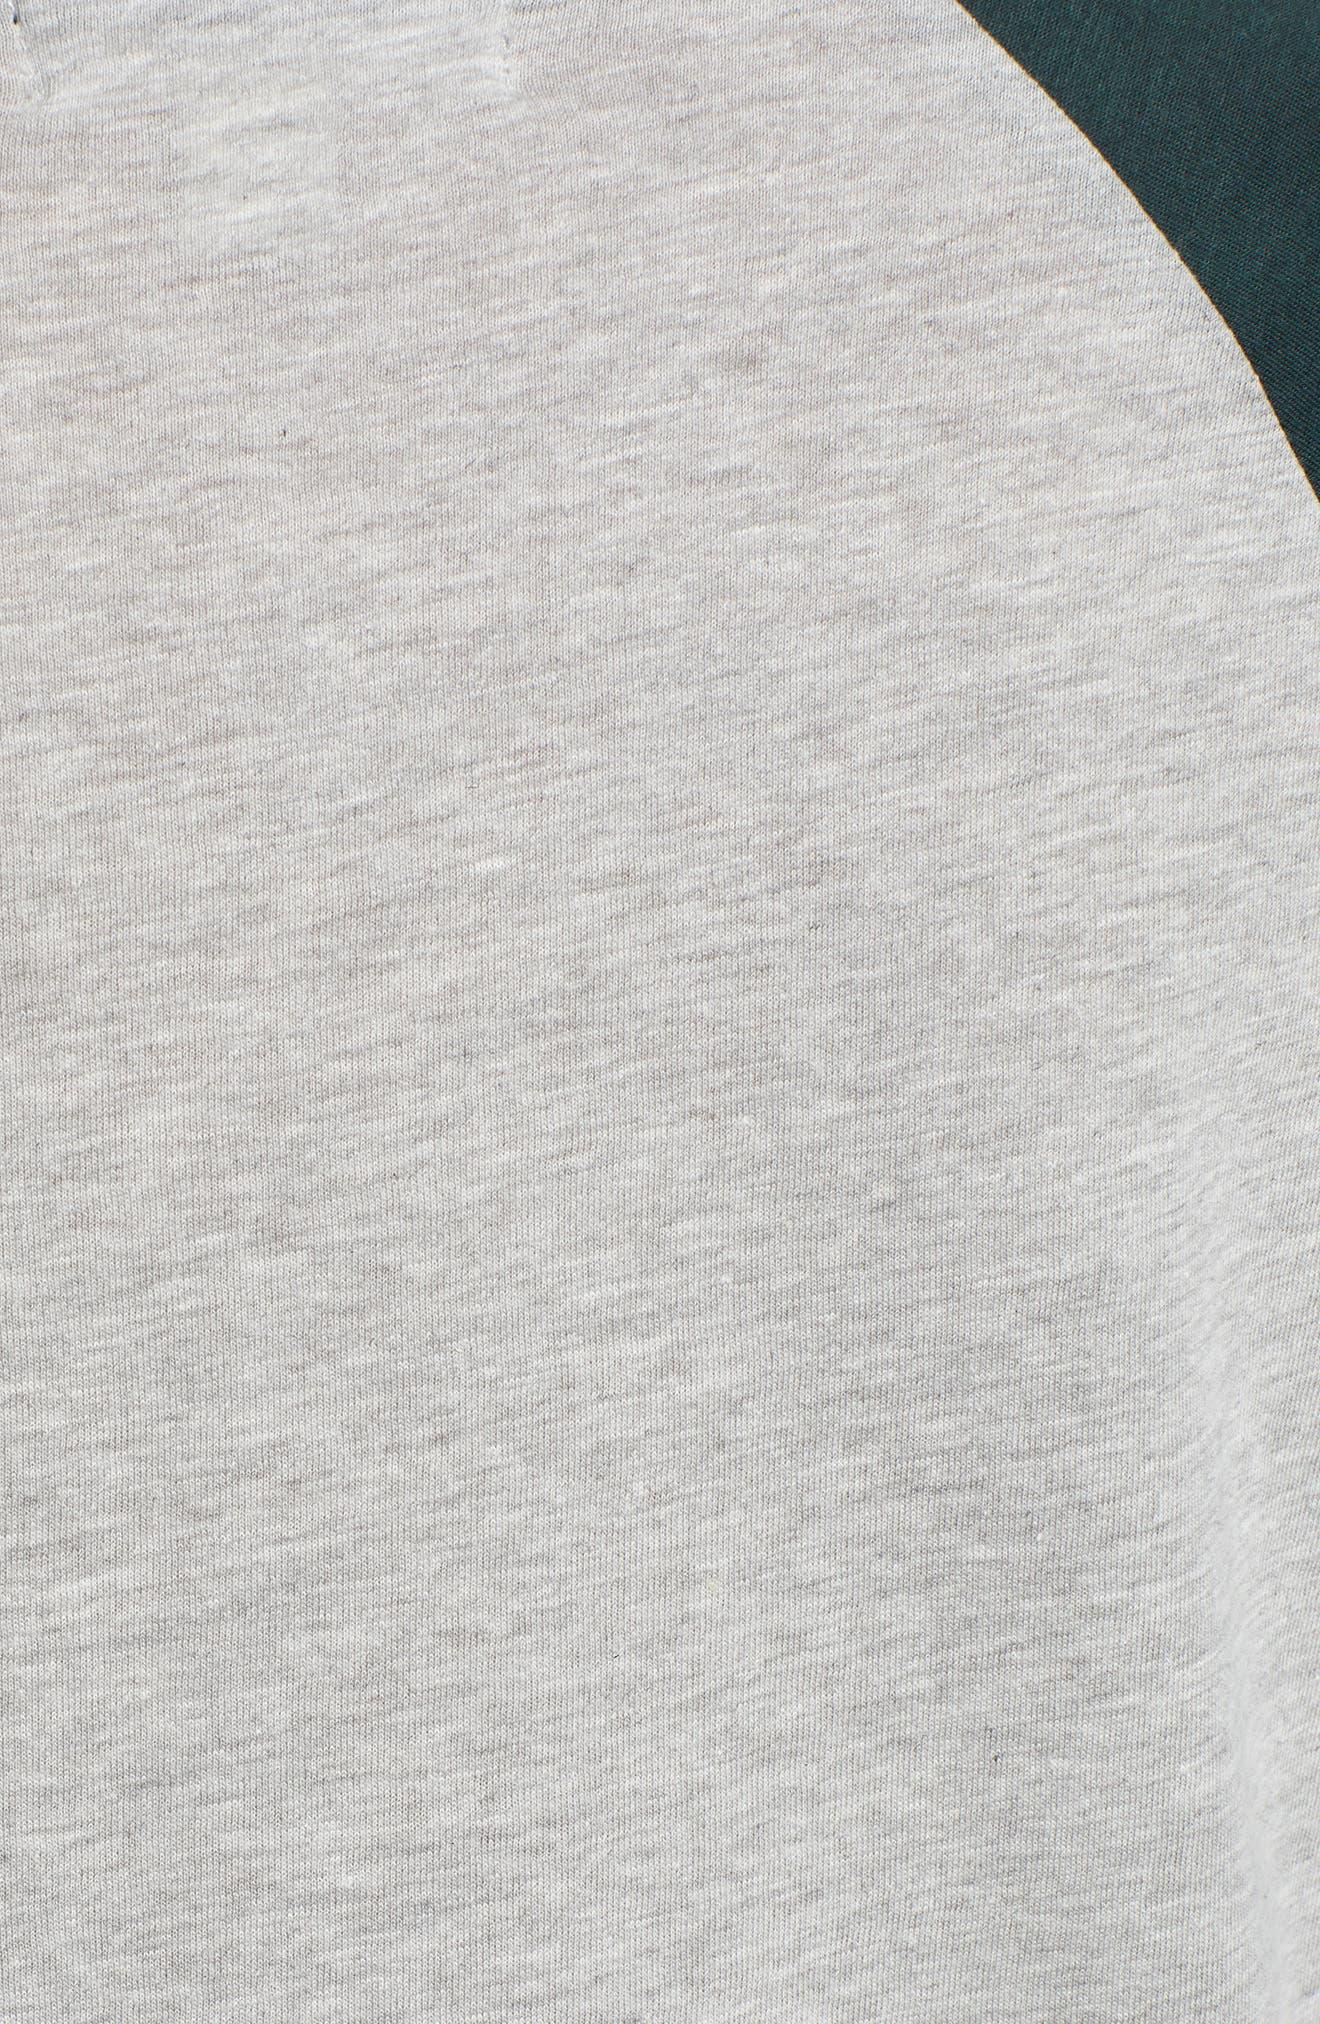 Colorblock Cotton Blend Raglan Top,                             Alternate thumbnail 5, color,                             GREY- GREEN GABLES COMBO